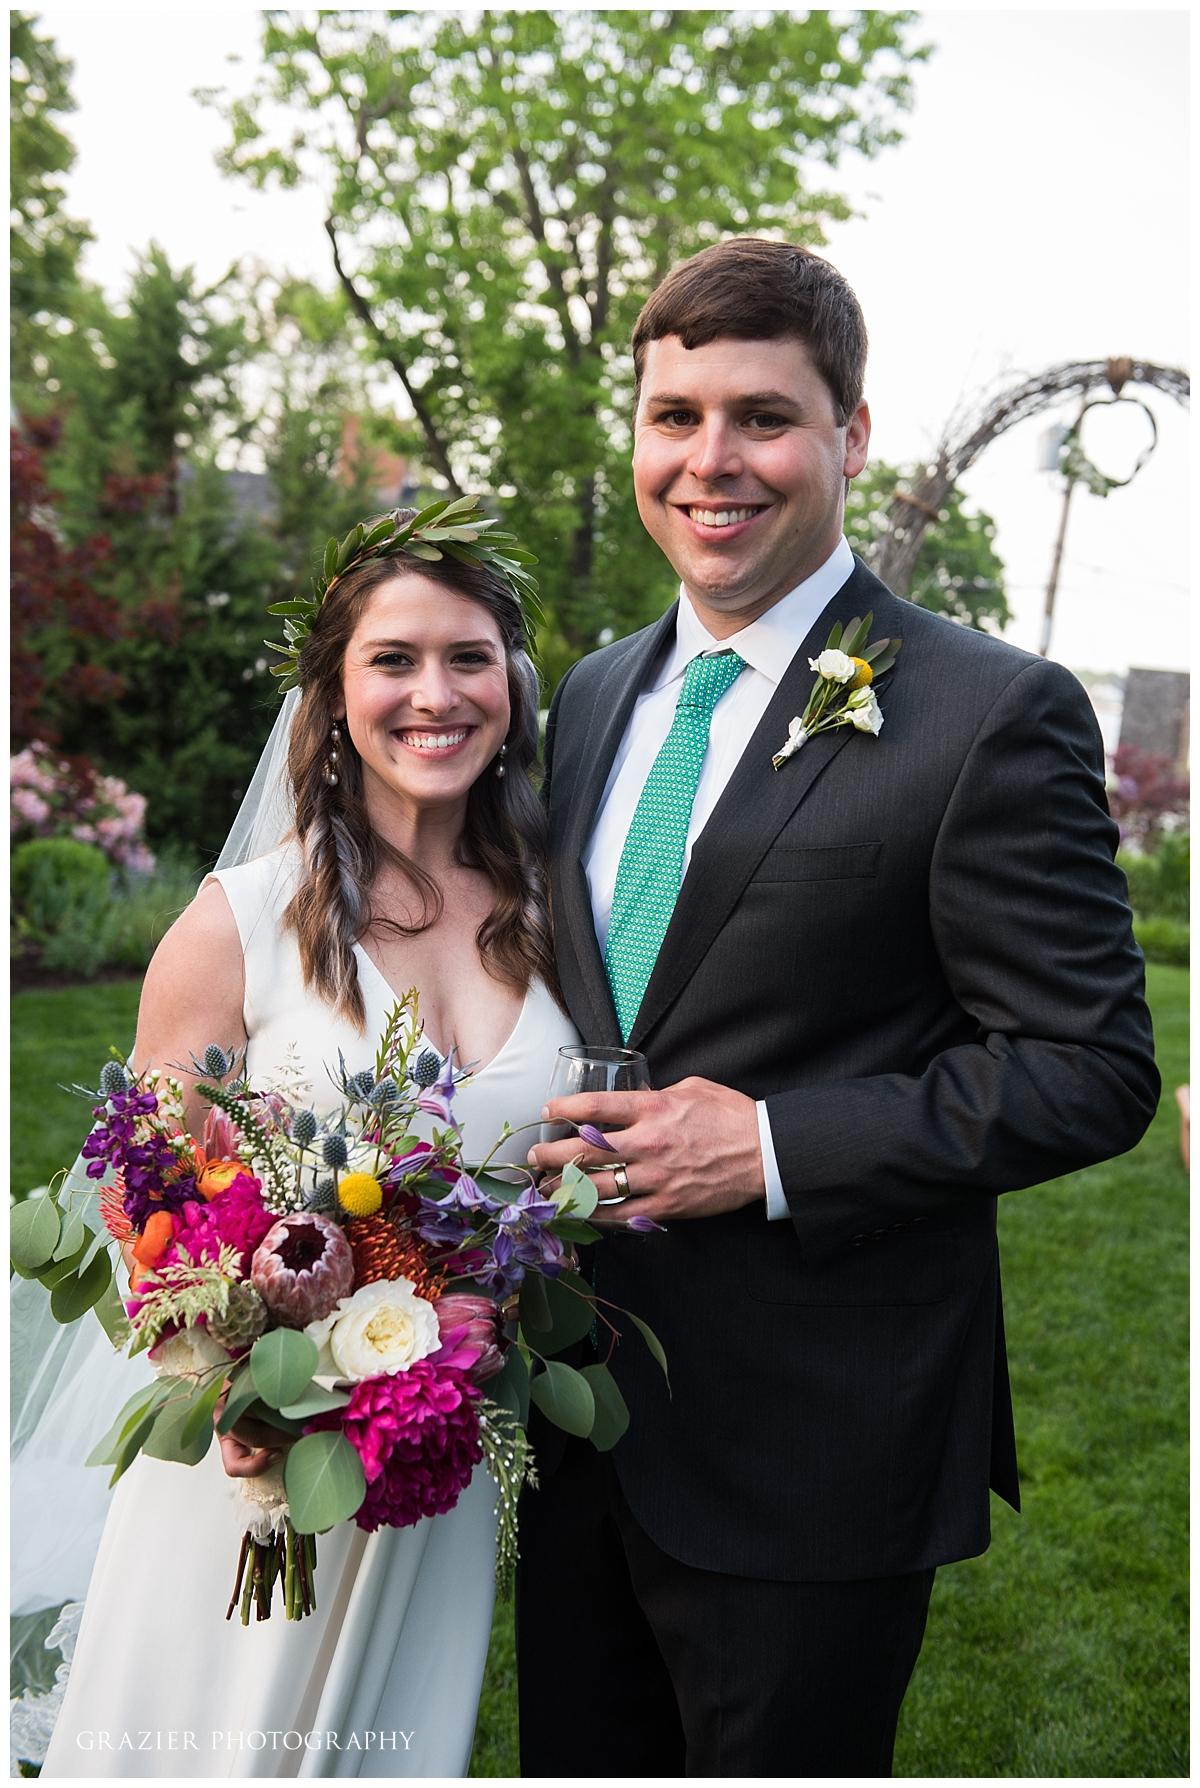 New Castle Wedding Grazier Photography 2017-60_WEB.jpg